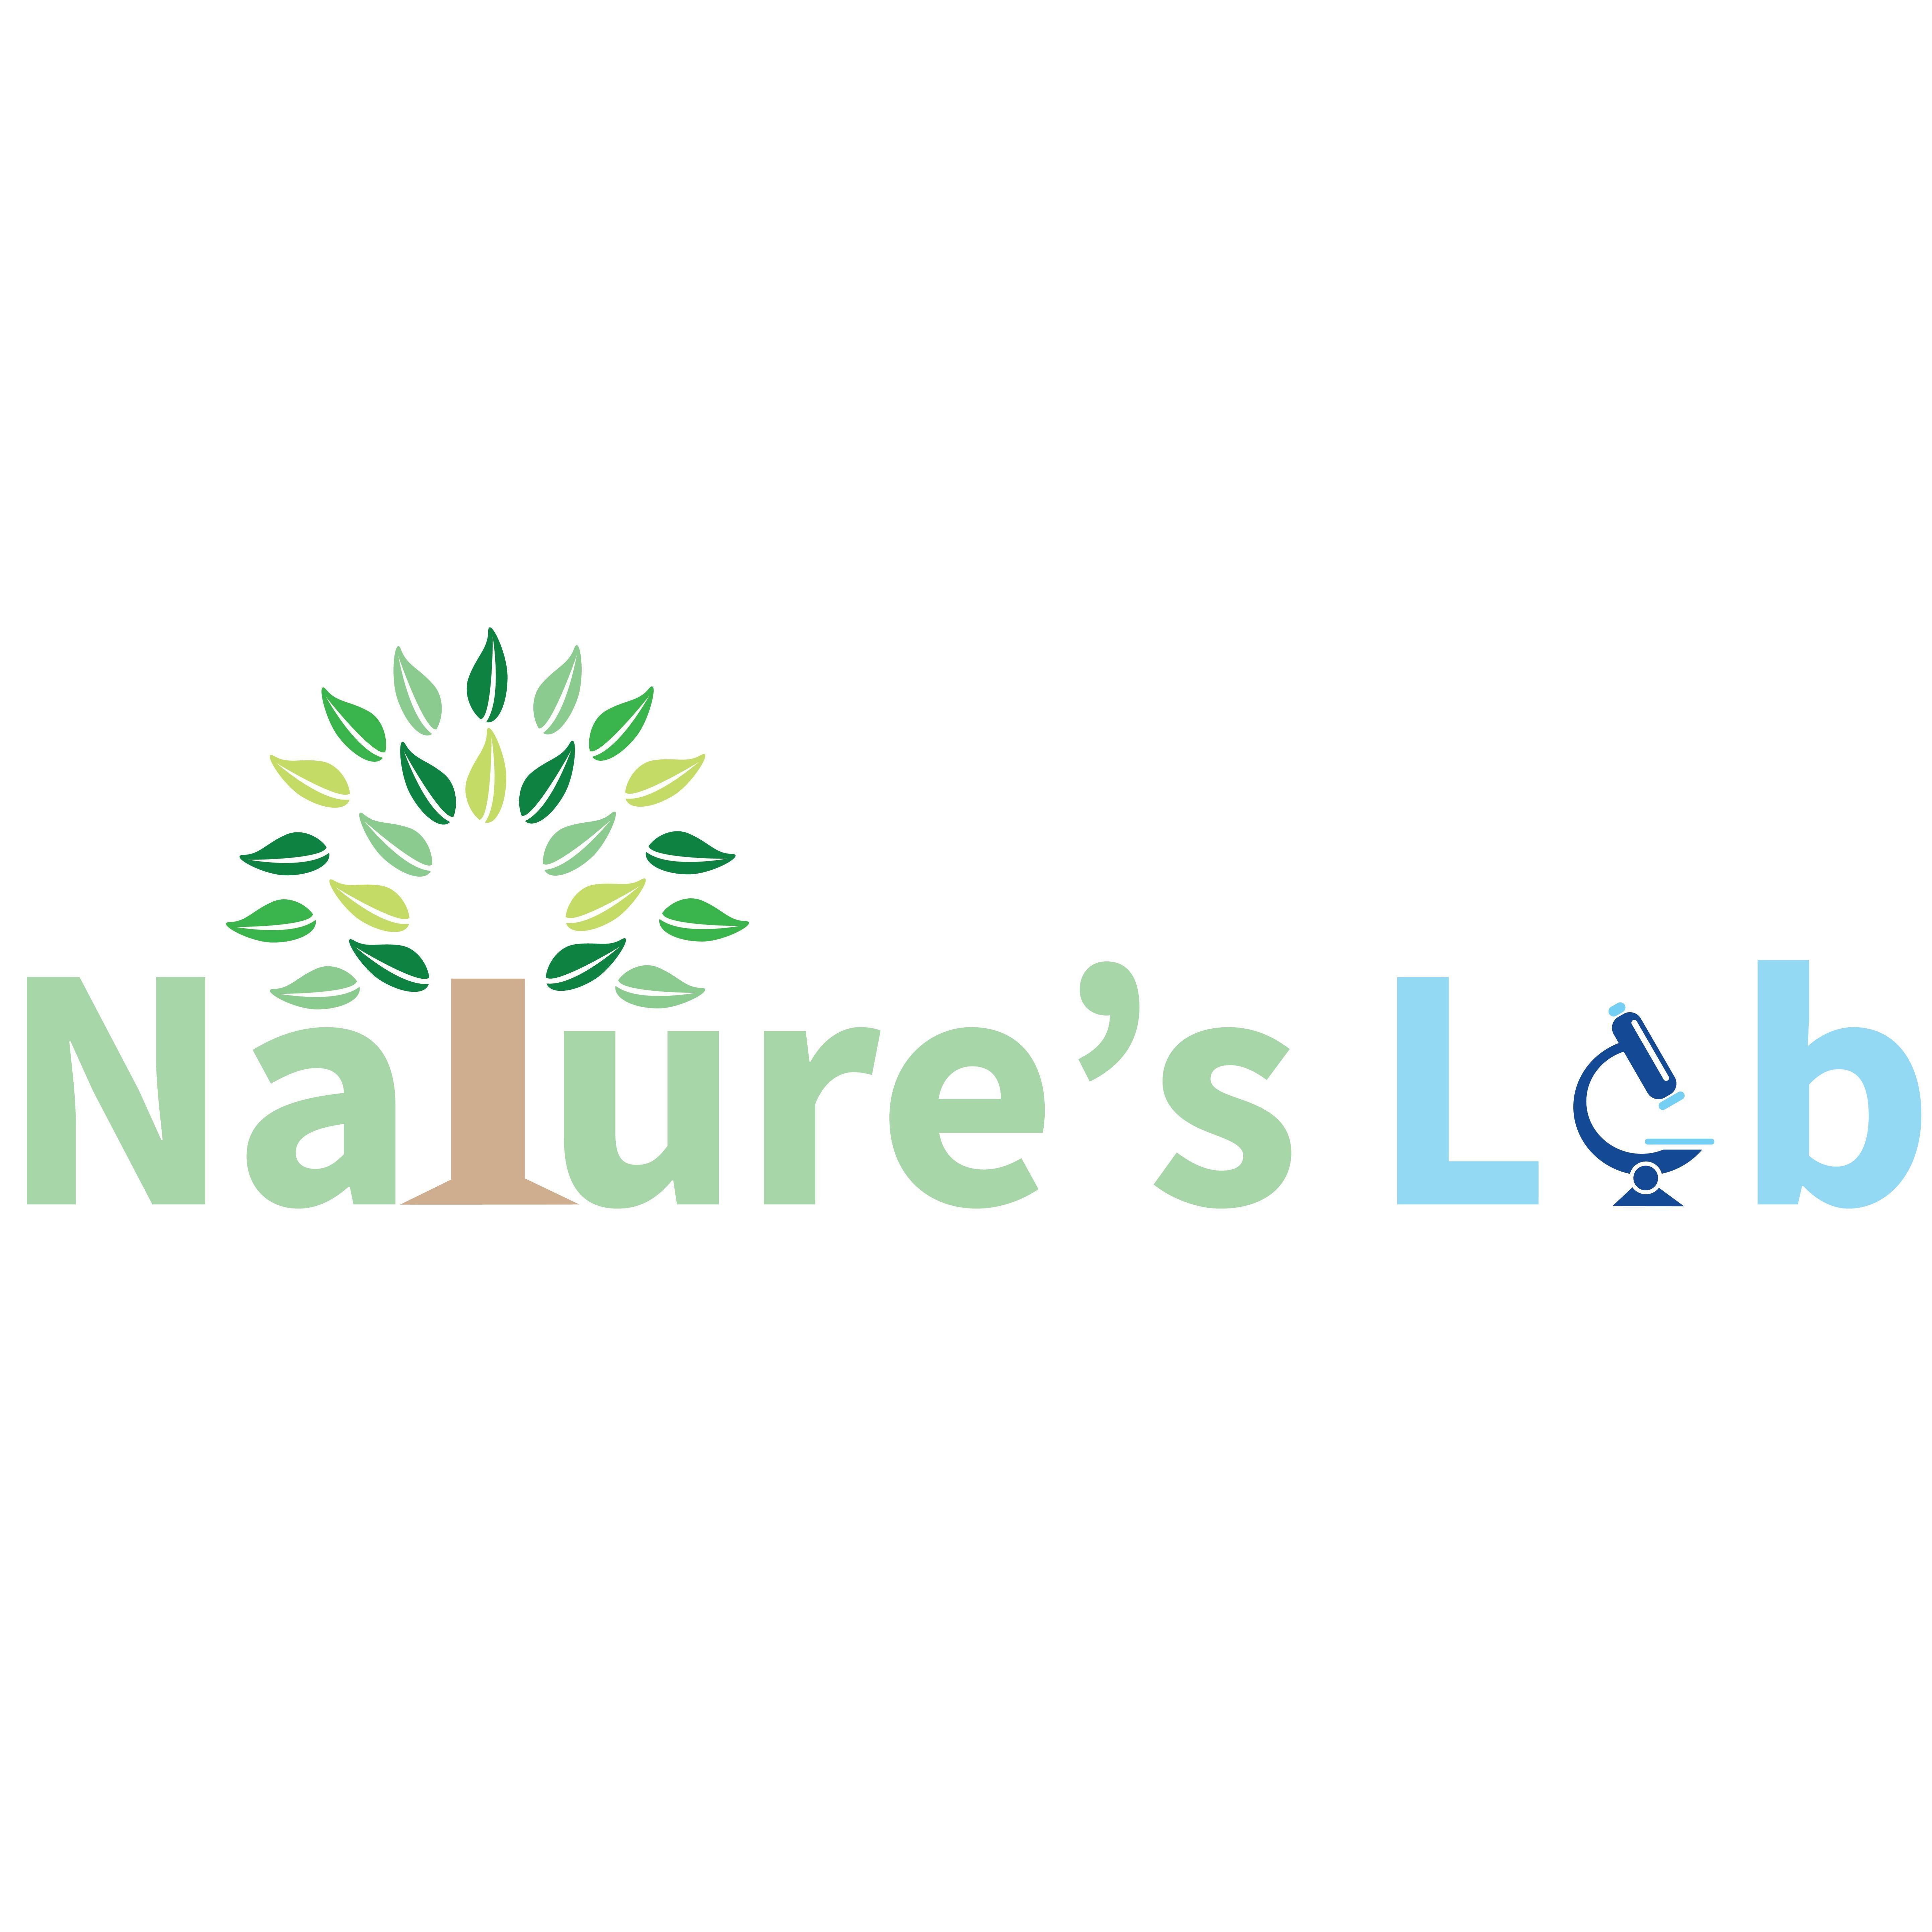 Nature's Lab Playschool